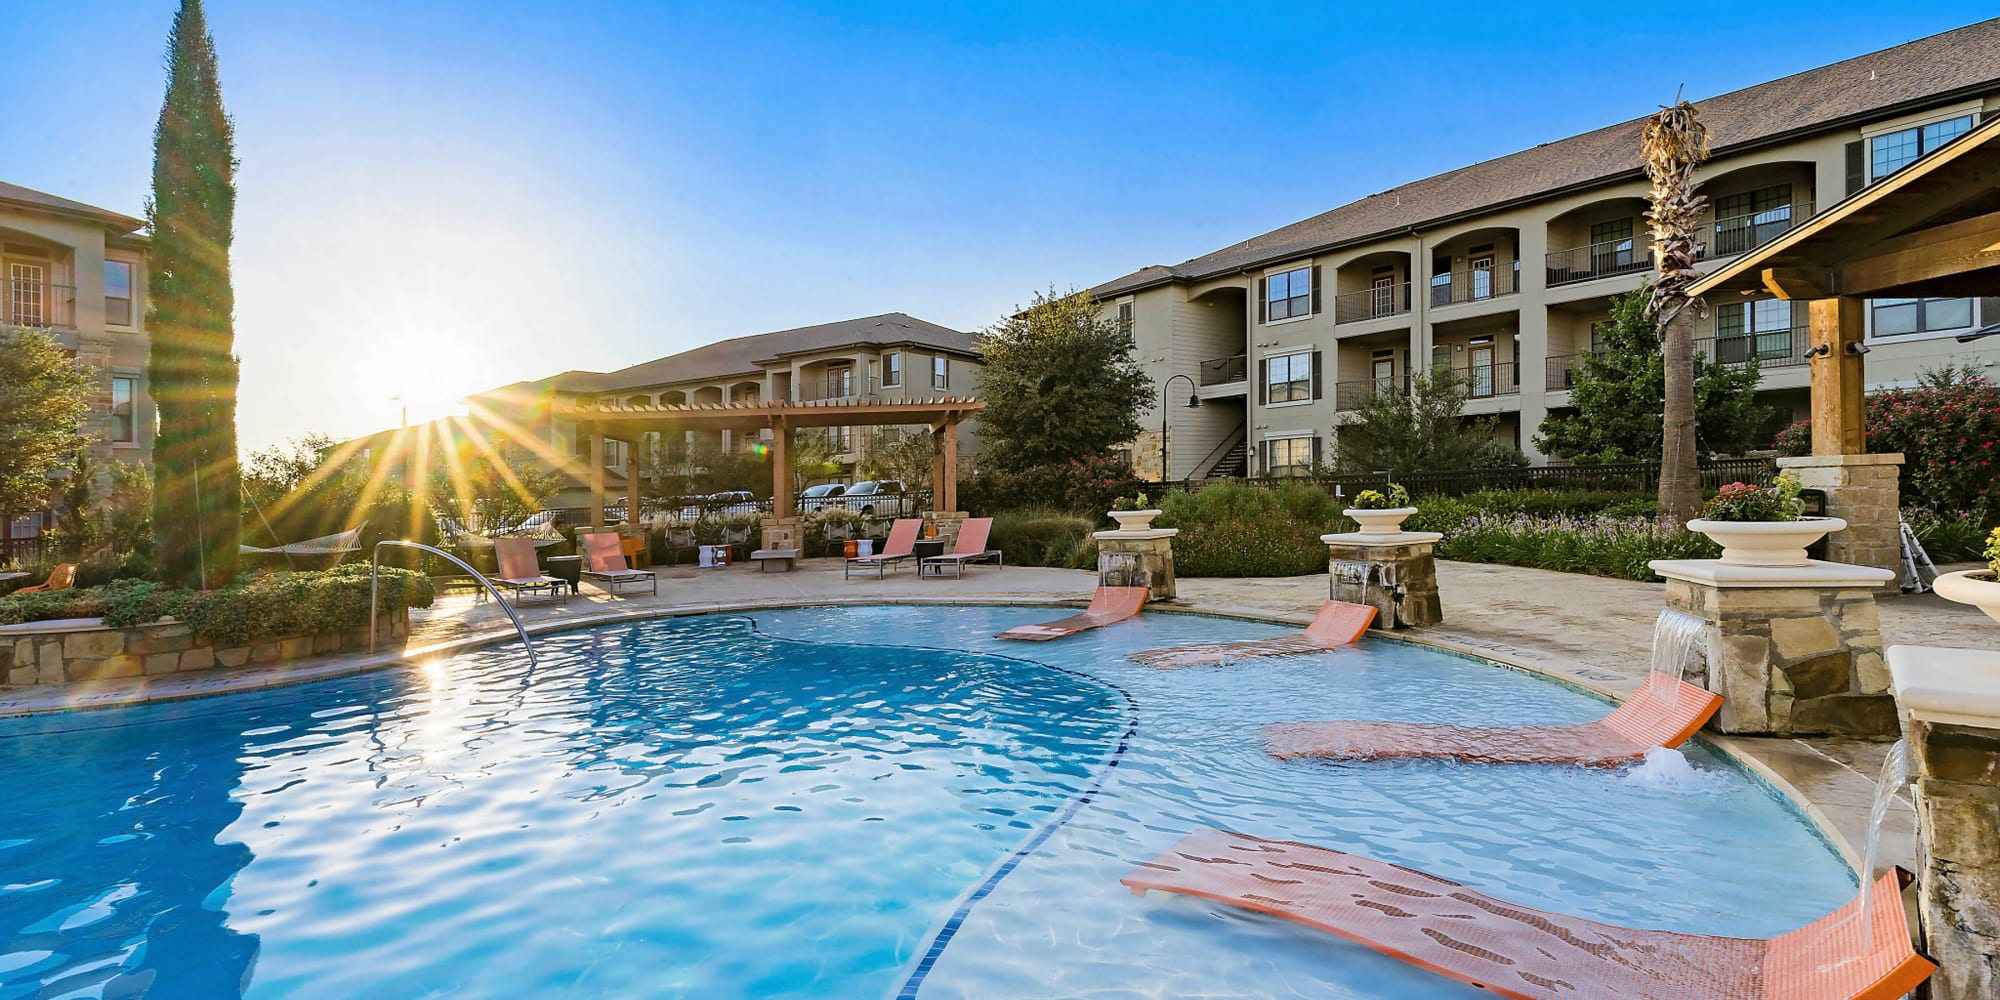 Apartments at Sedona Ranch in Odessa, Texas